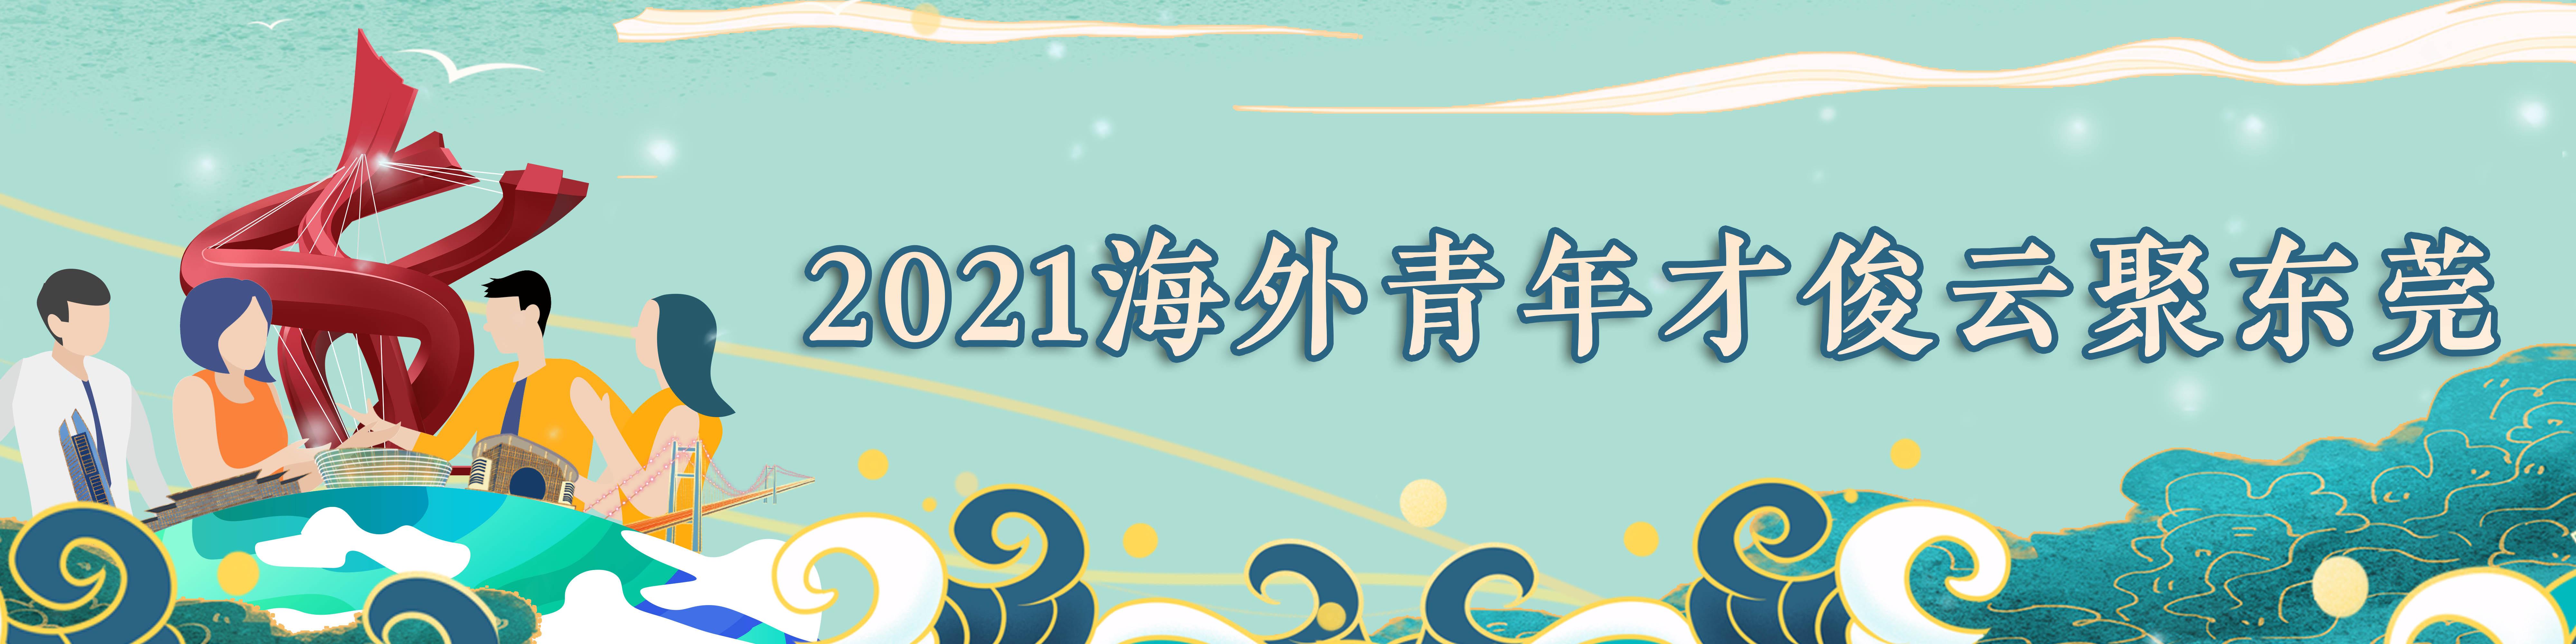 banner  南方+ 龚名扬 制图